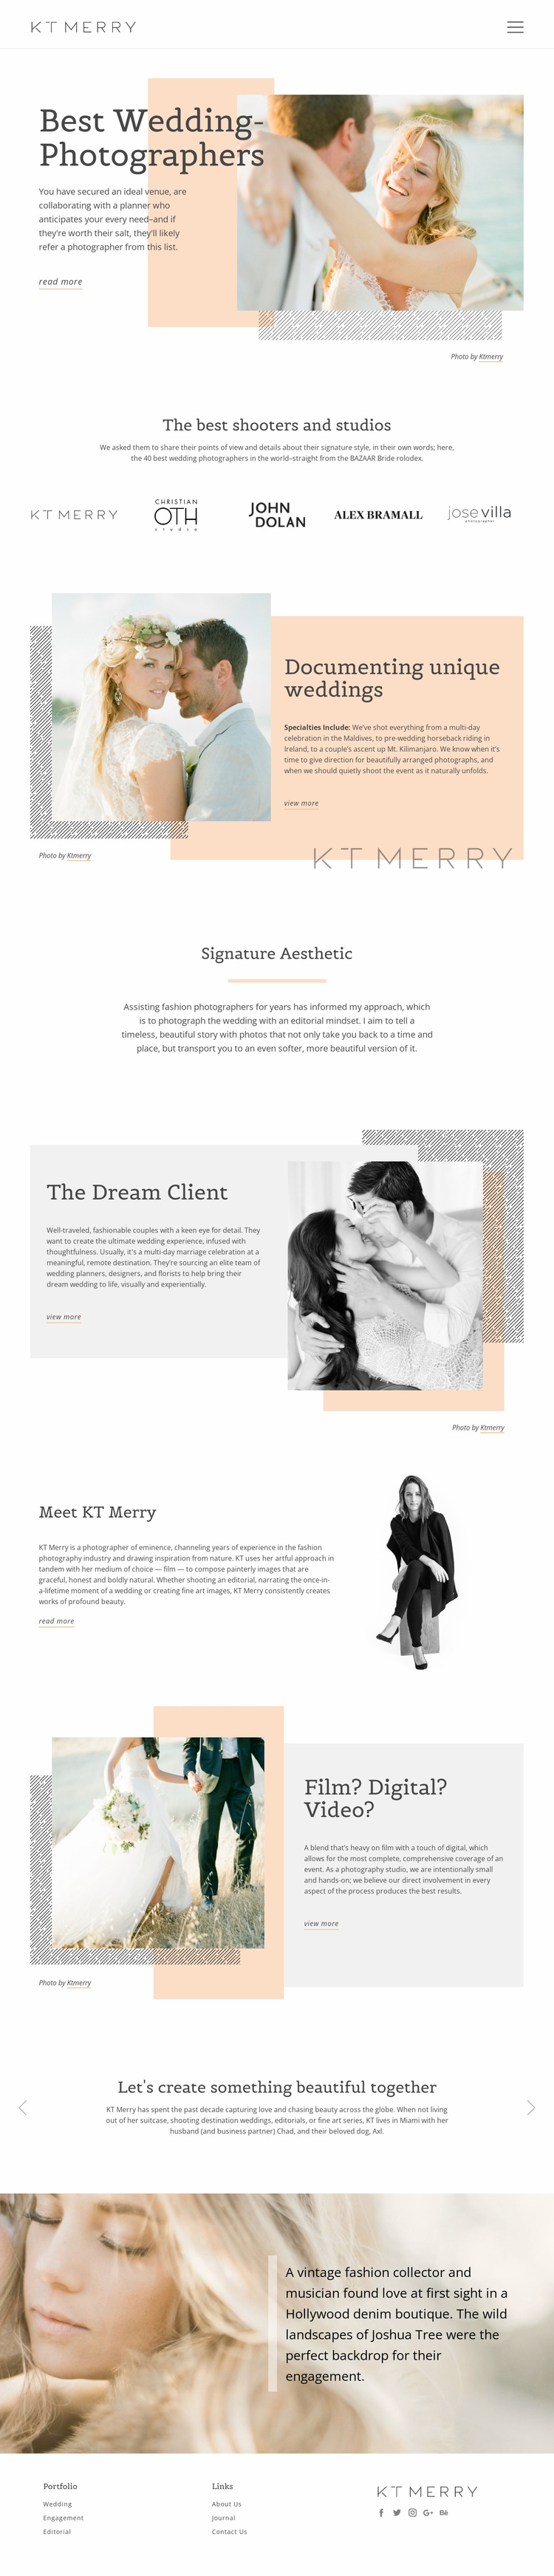 Wedding Photographers Landing Page